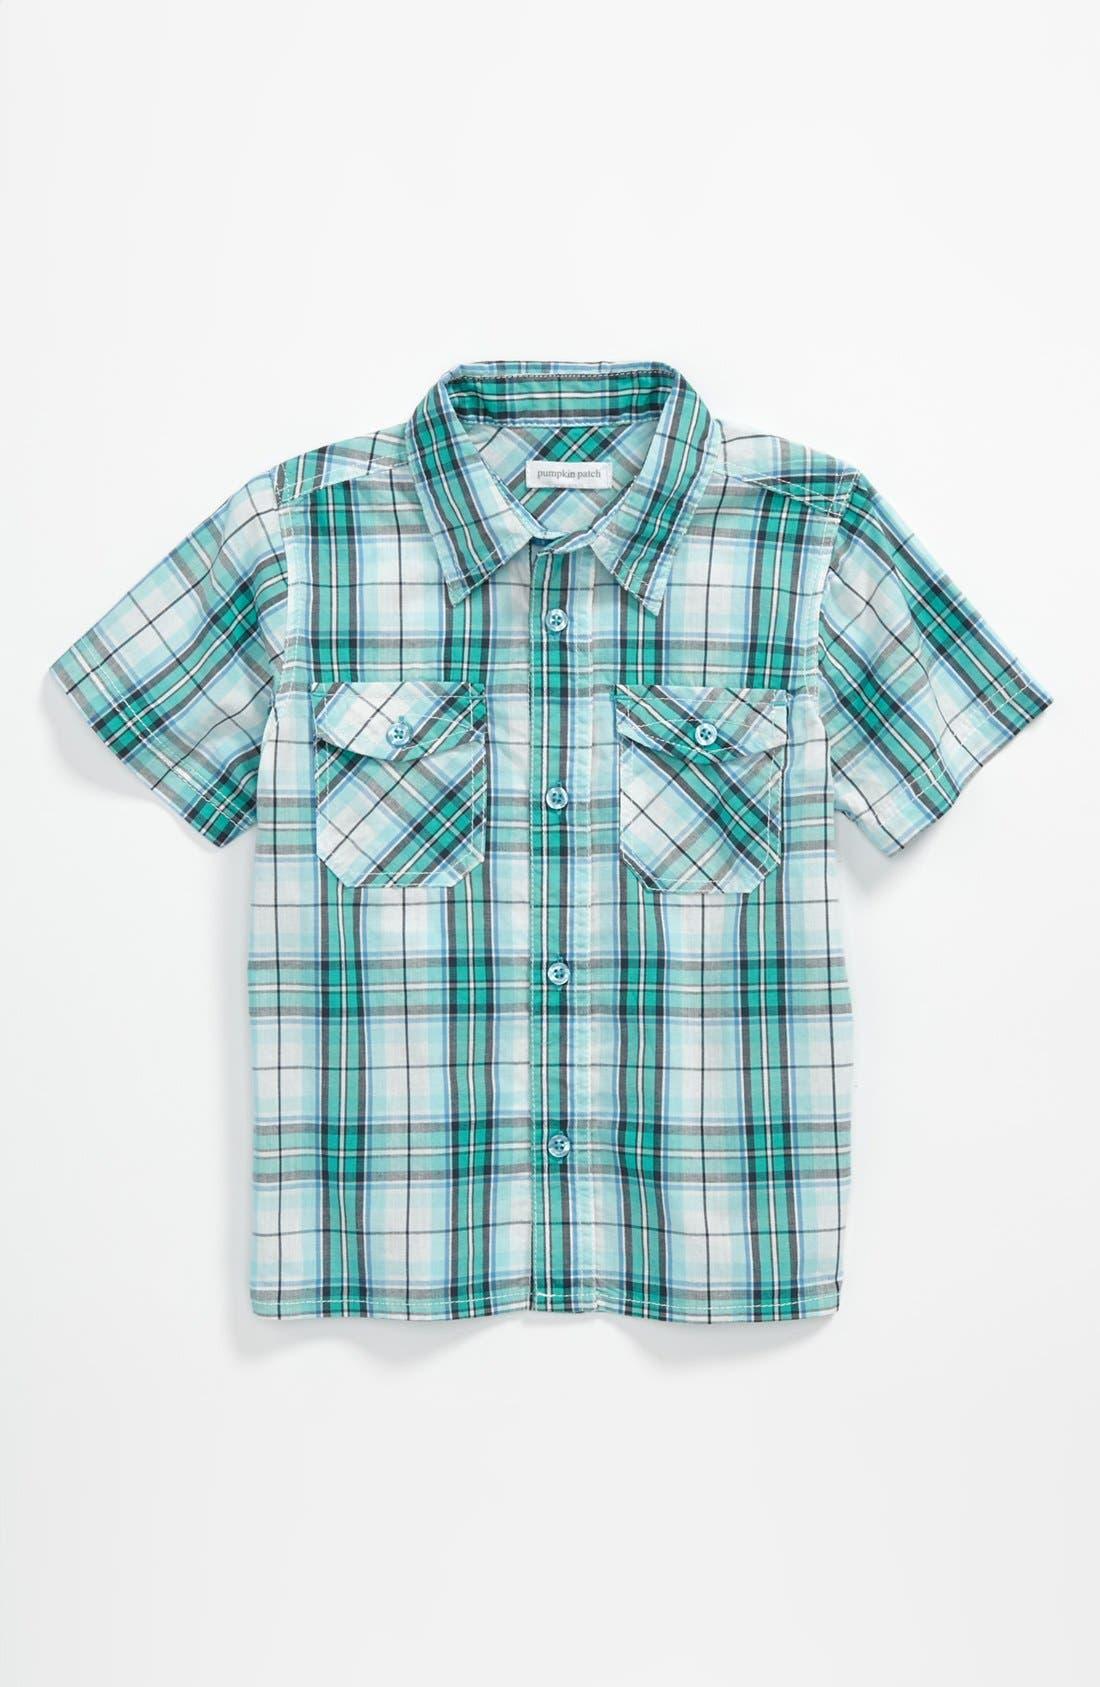 Main Image - Pumpkin Patch Check Shirt (Toddler)